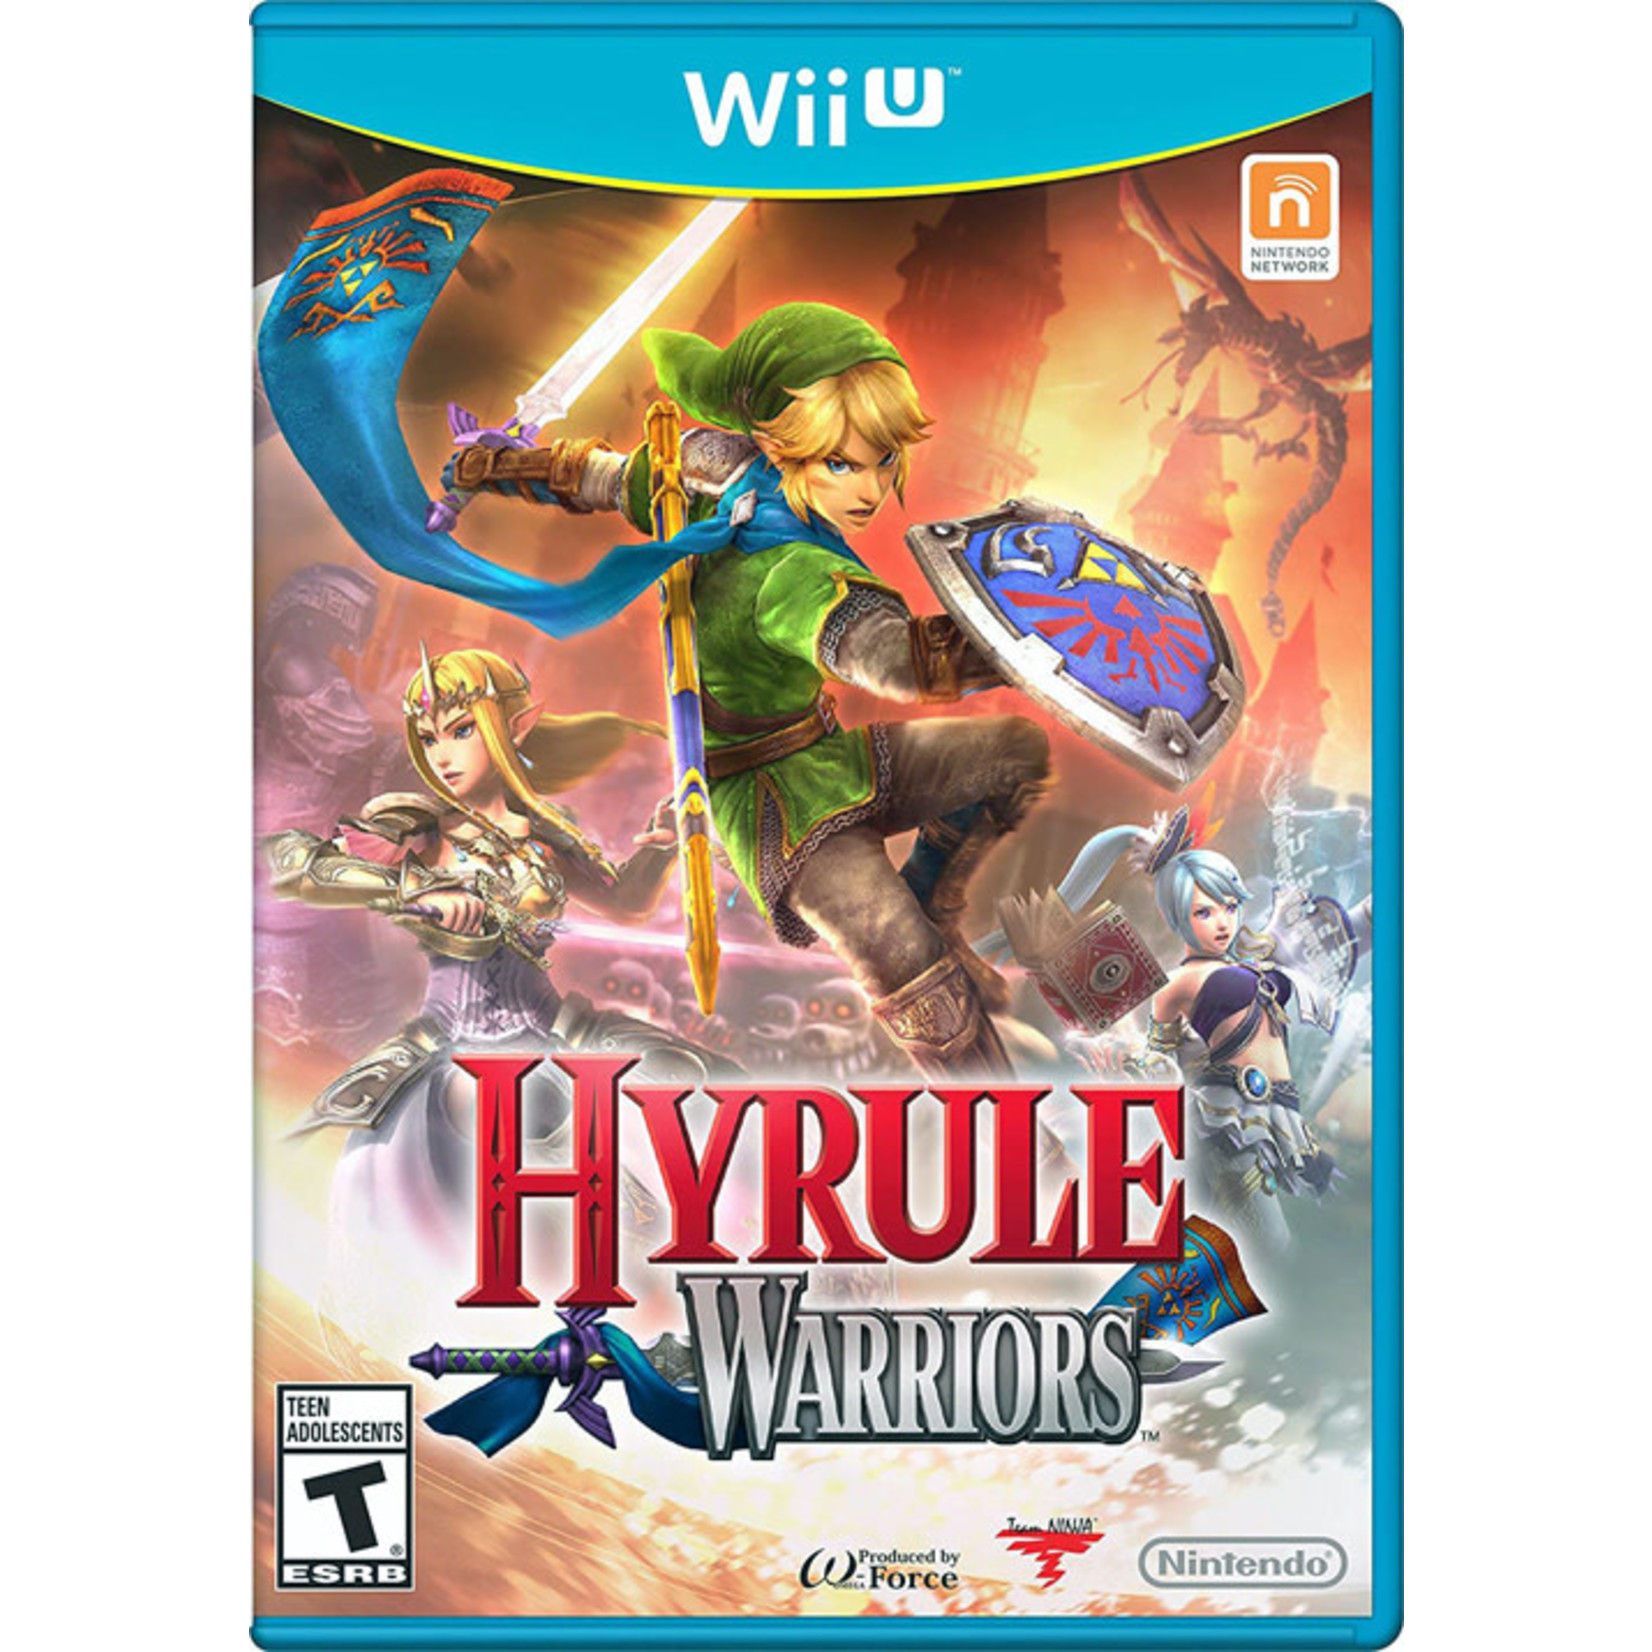 WIIU-Hyrule Warriors